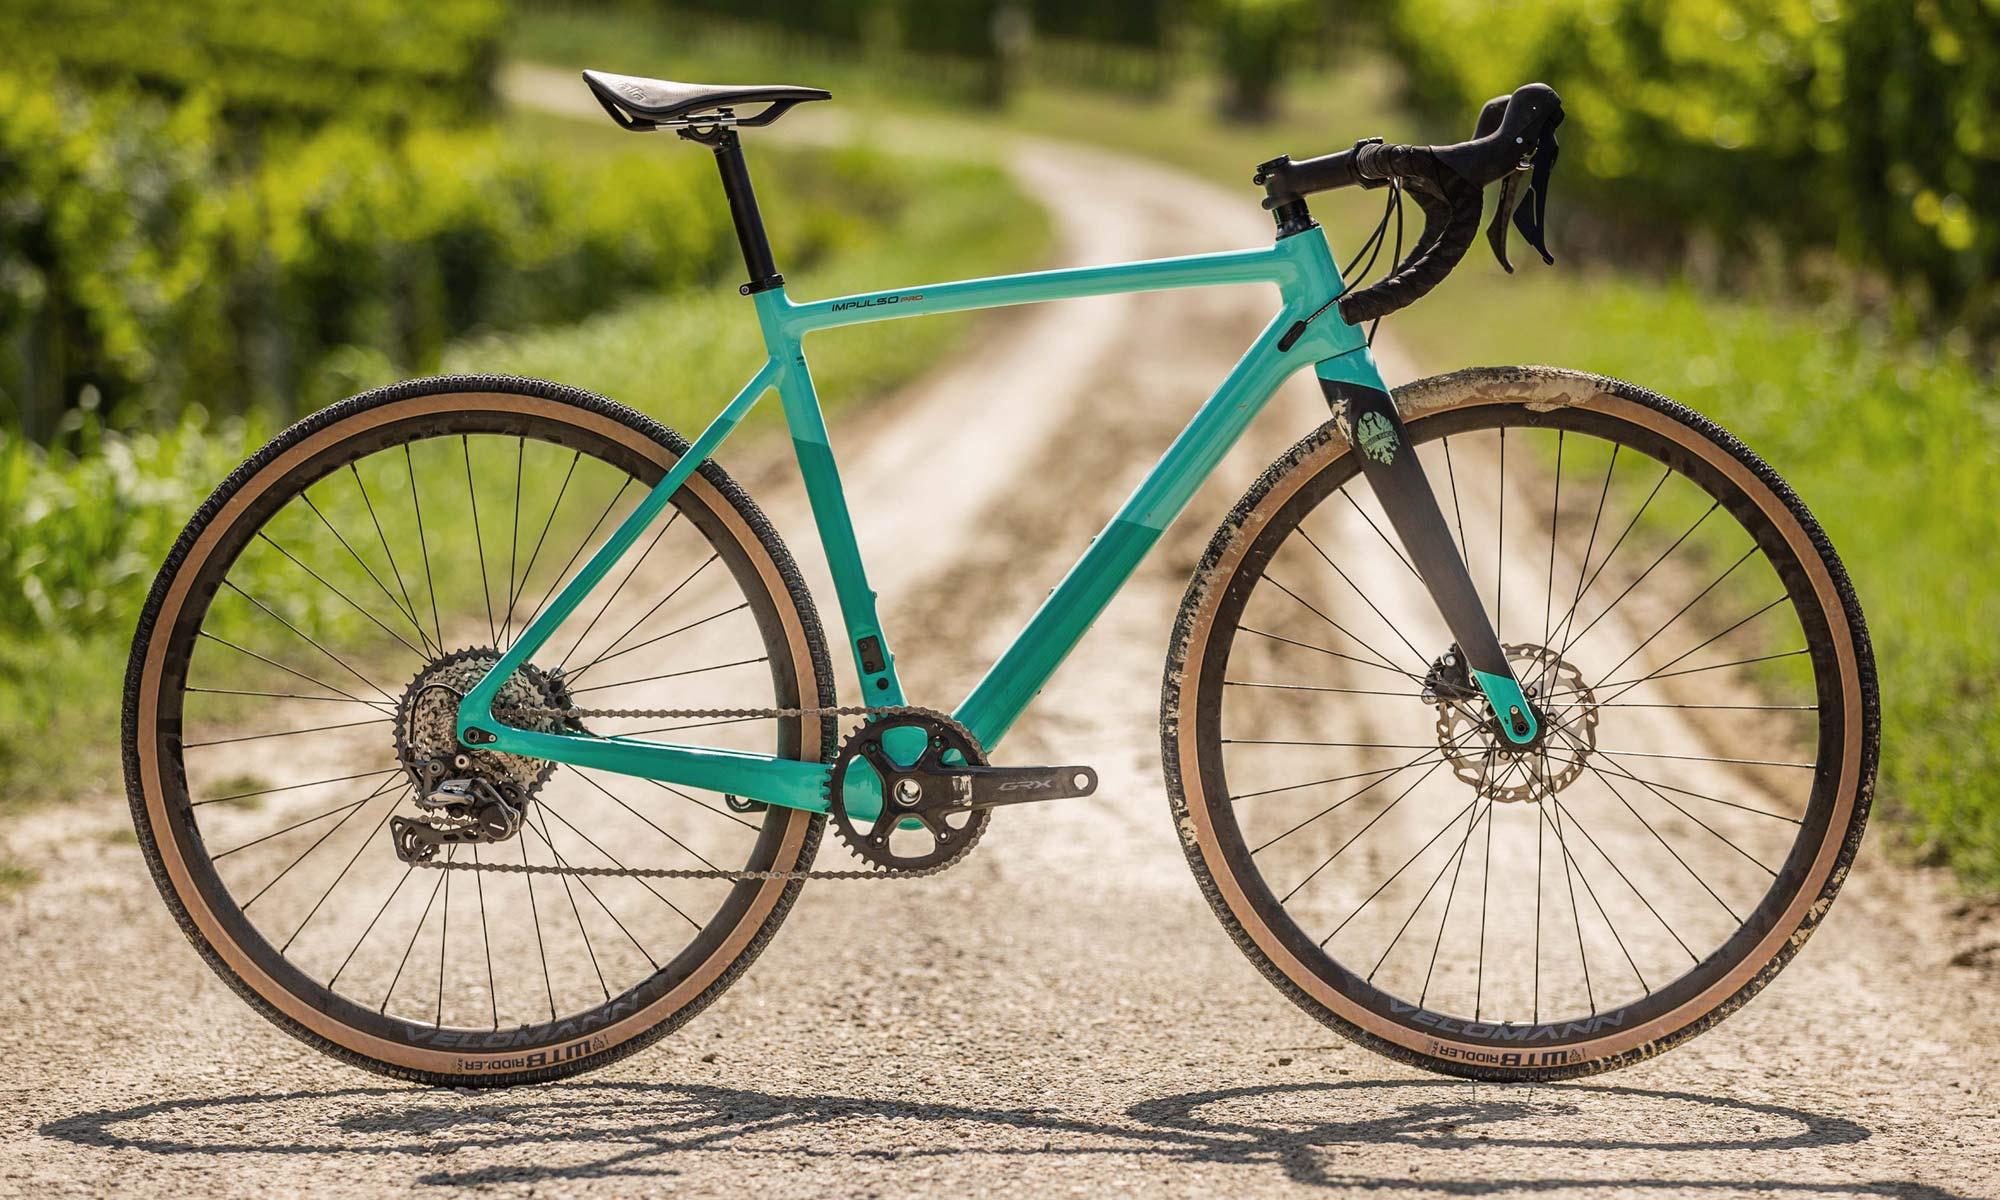 2022 Bianchi Impulso Pro carbon gravel bike, Zolder Pro CX cross cyclocross bike reborn,complete